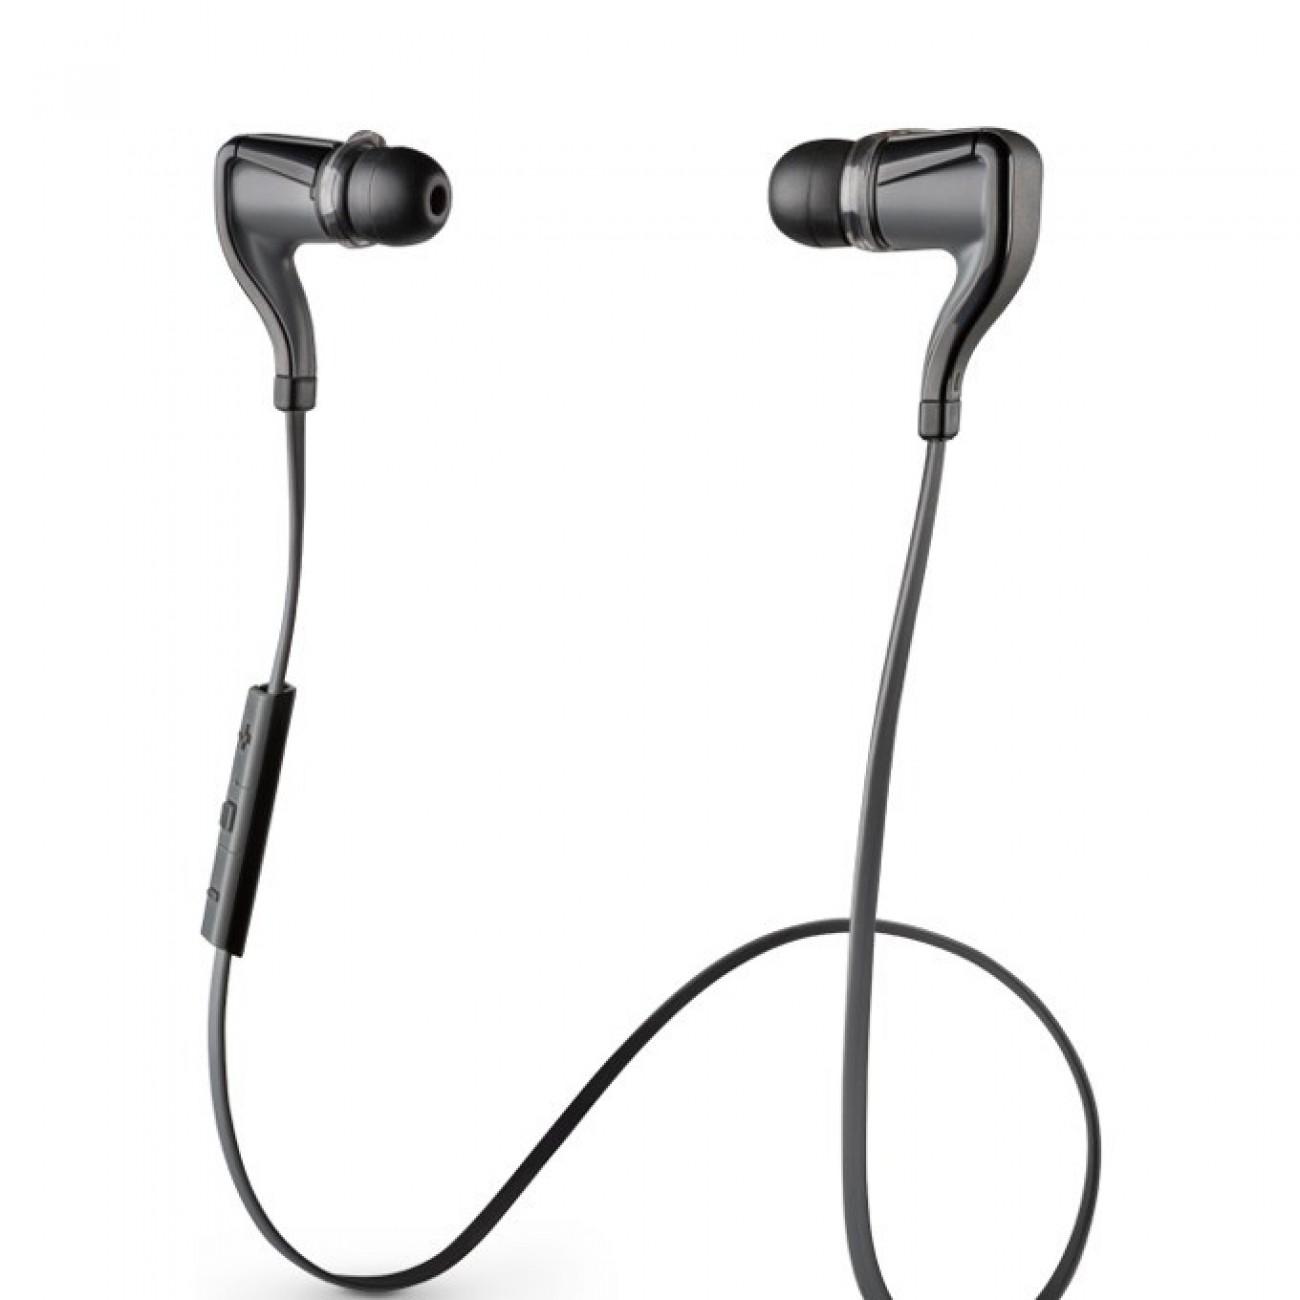 Слушалки Plantronics BackBeat Go 2 (черни), Bluetooth, тип тапи, водо/влагоустойчиви, микрофон в Слушалки -  | Alleop